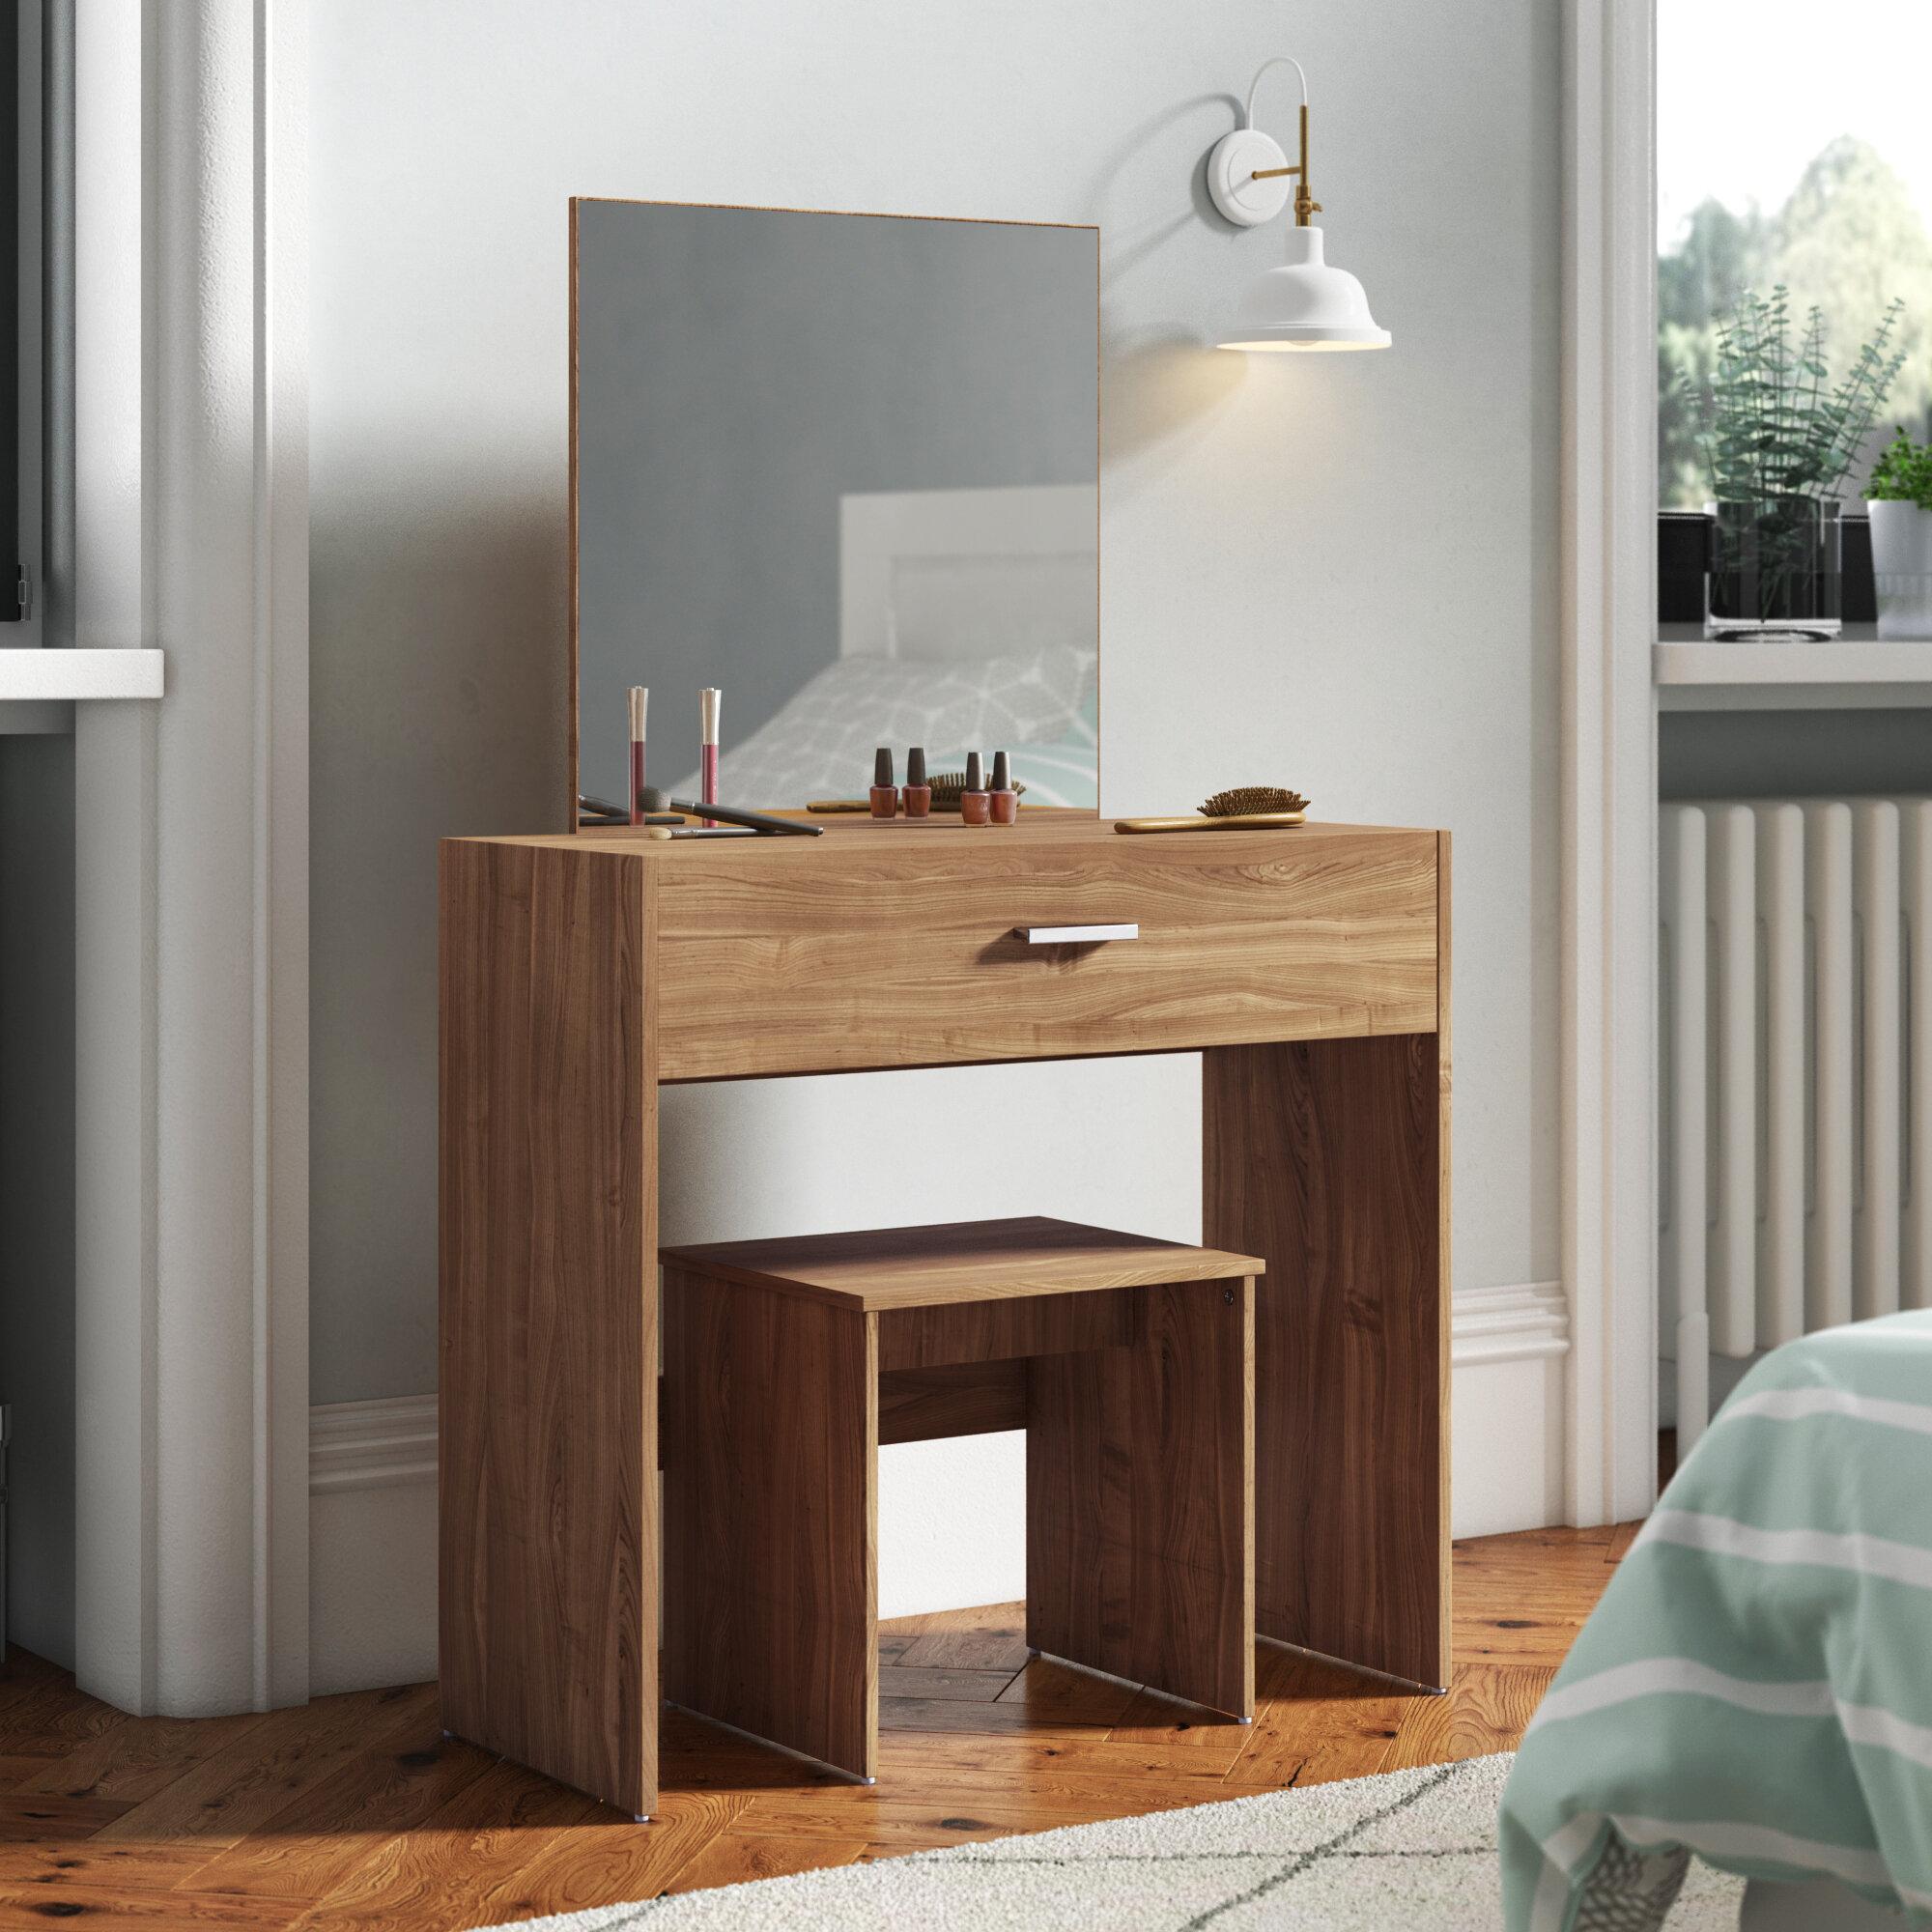 Zipcode Design Buckland Dressing Table Set With Mirror Reviews Wayfair Co Uk